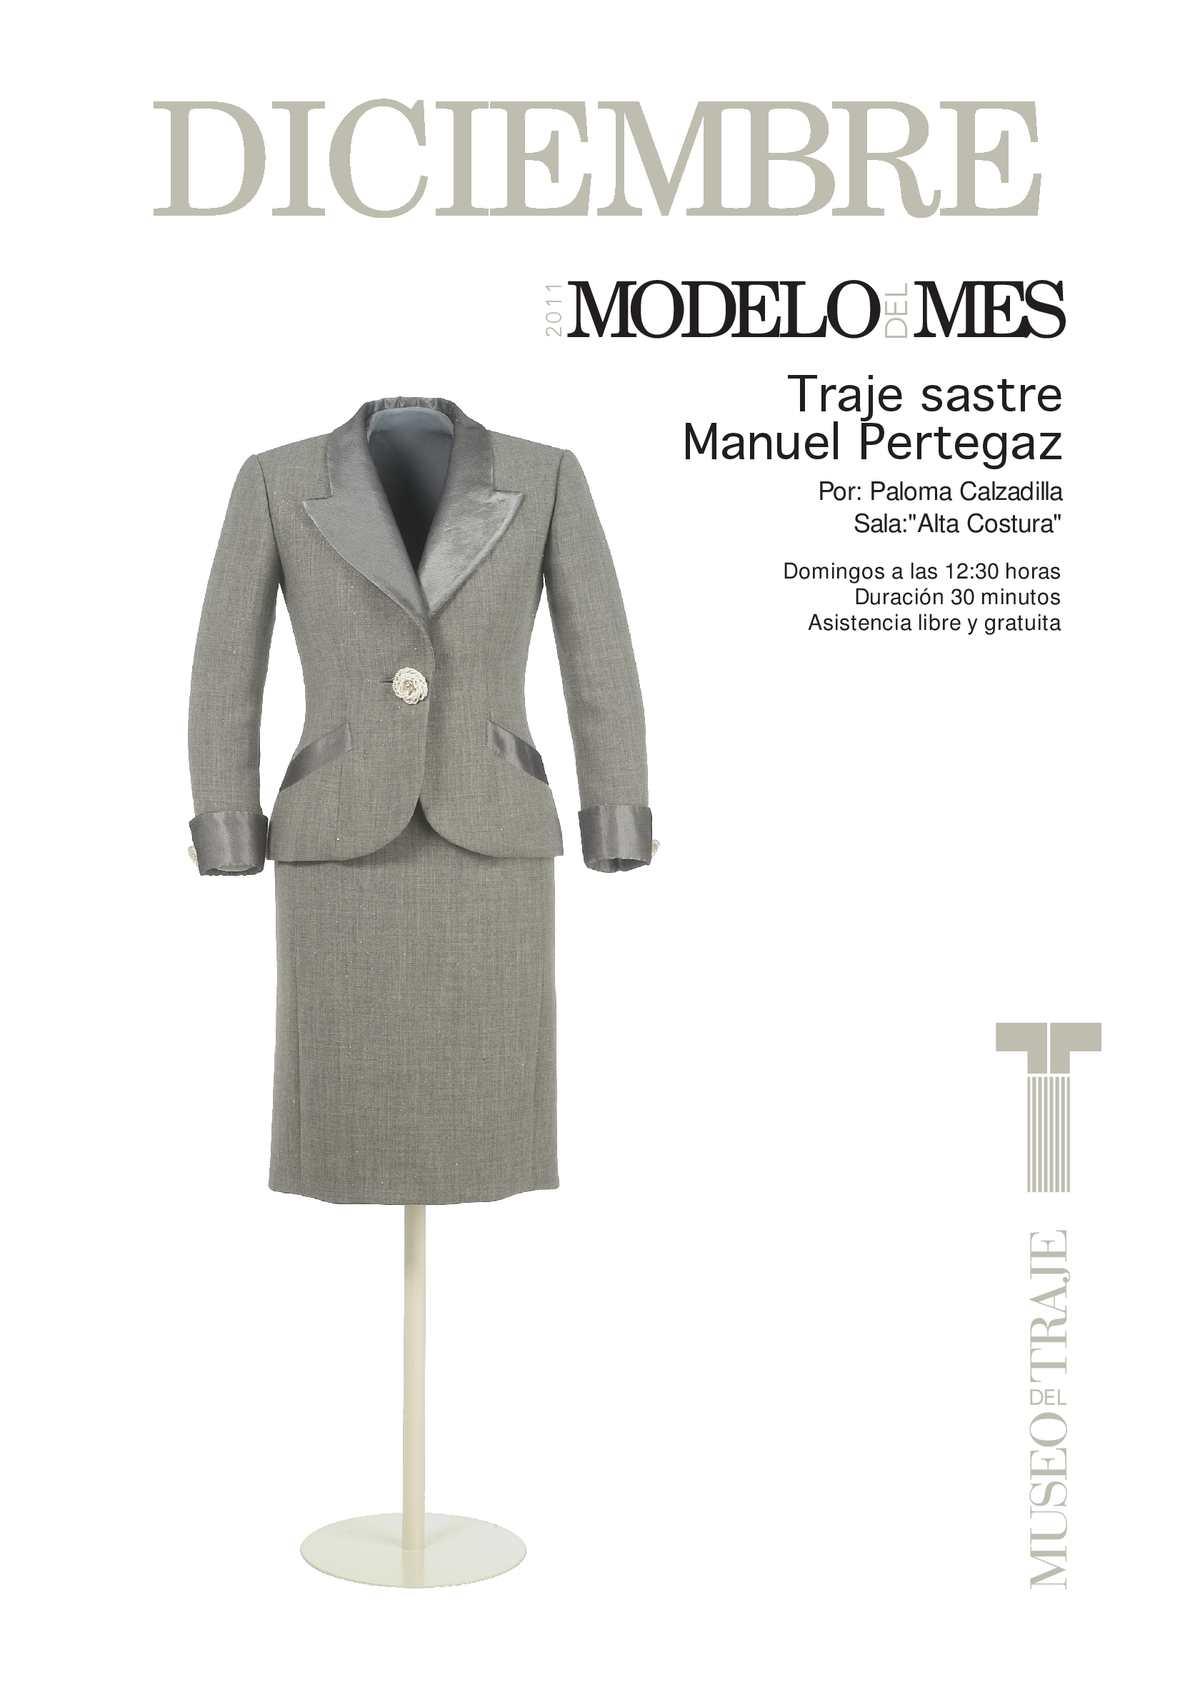 Calaméo - Traje sastre de Manuel Pertegaz